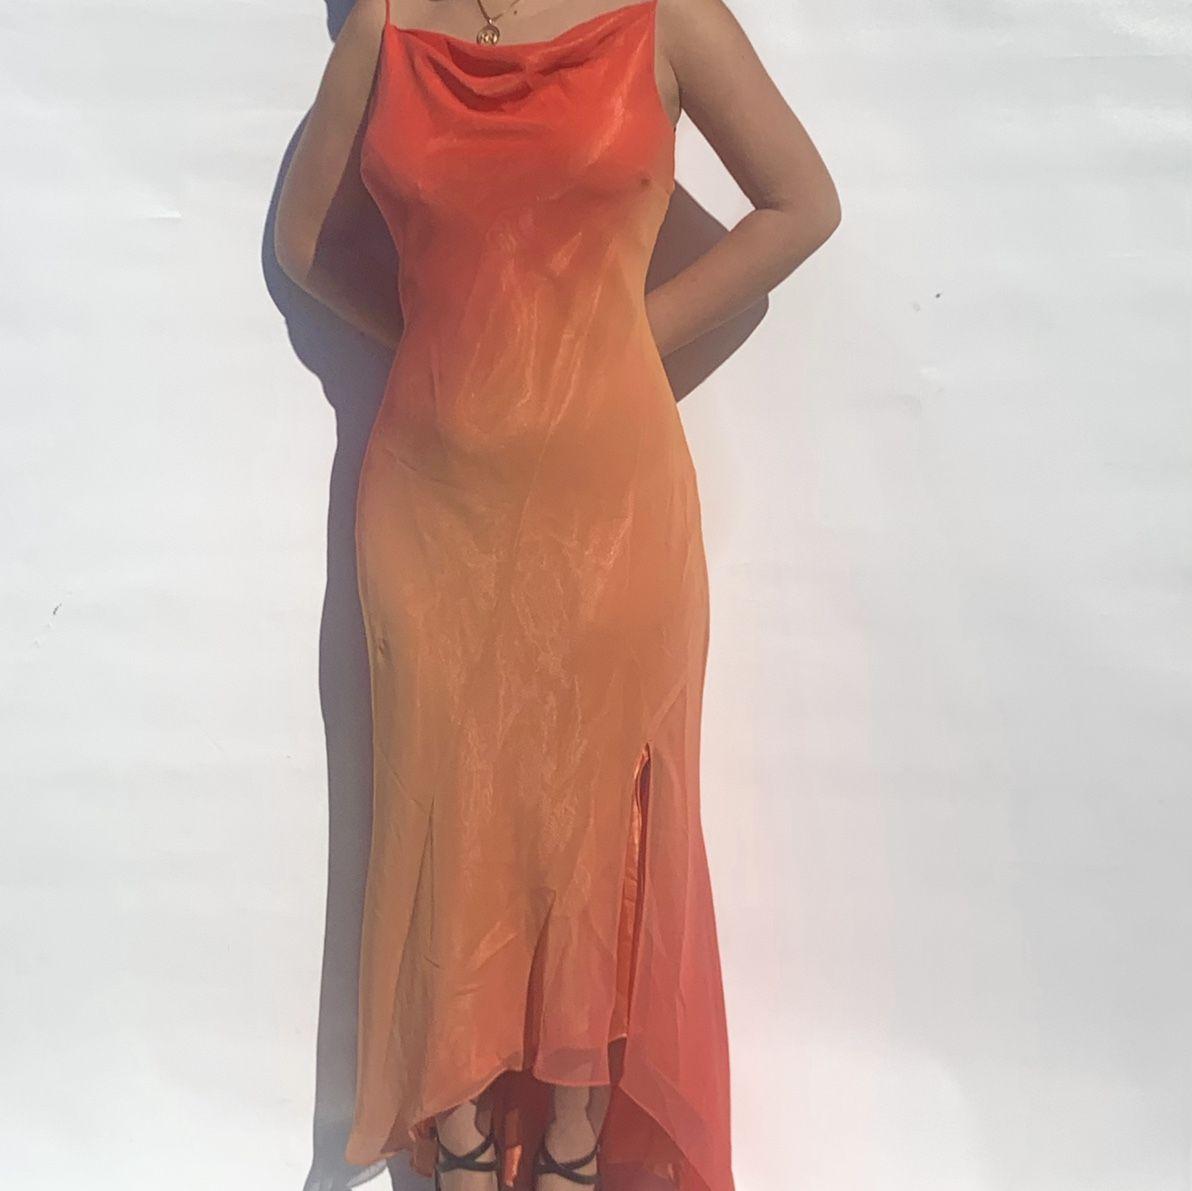 Blue Satin Corset Formal Dress Vintage From Depop Formal Dresses Dresses Vintage Formal Dresses [ 1191 x 1192 Pixel ]